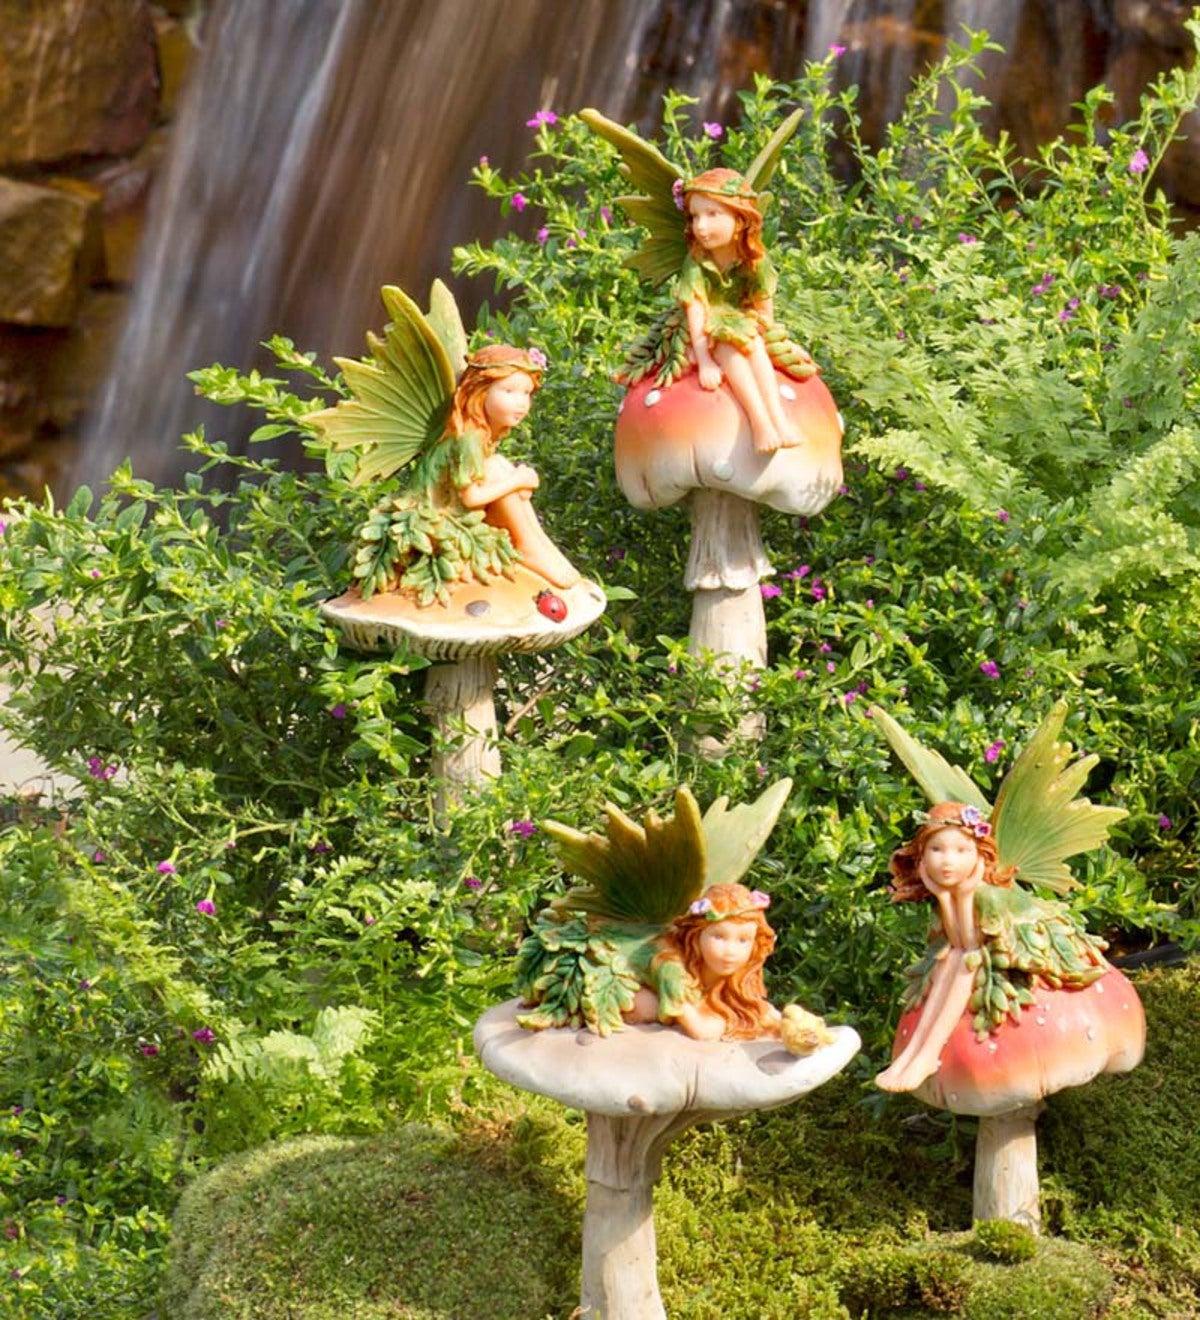 Genial Fairies On Mushrooms Garden Stakes, Set Of 4